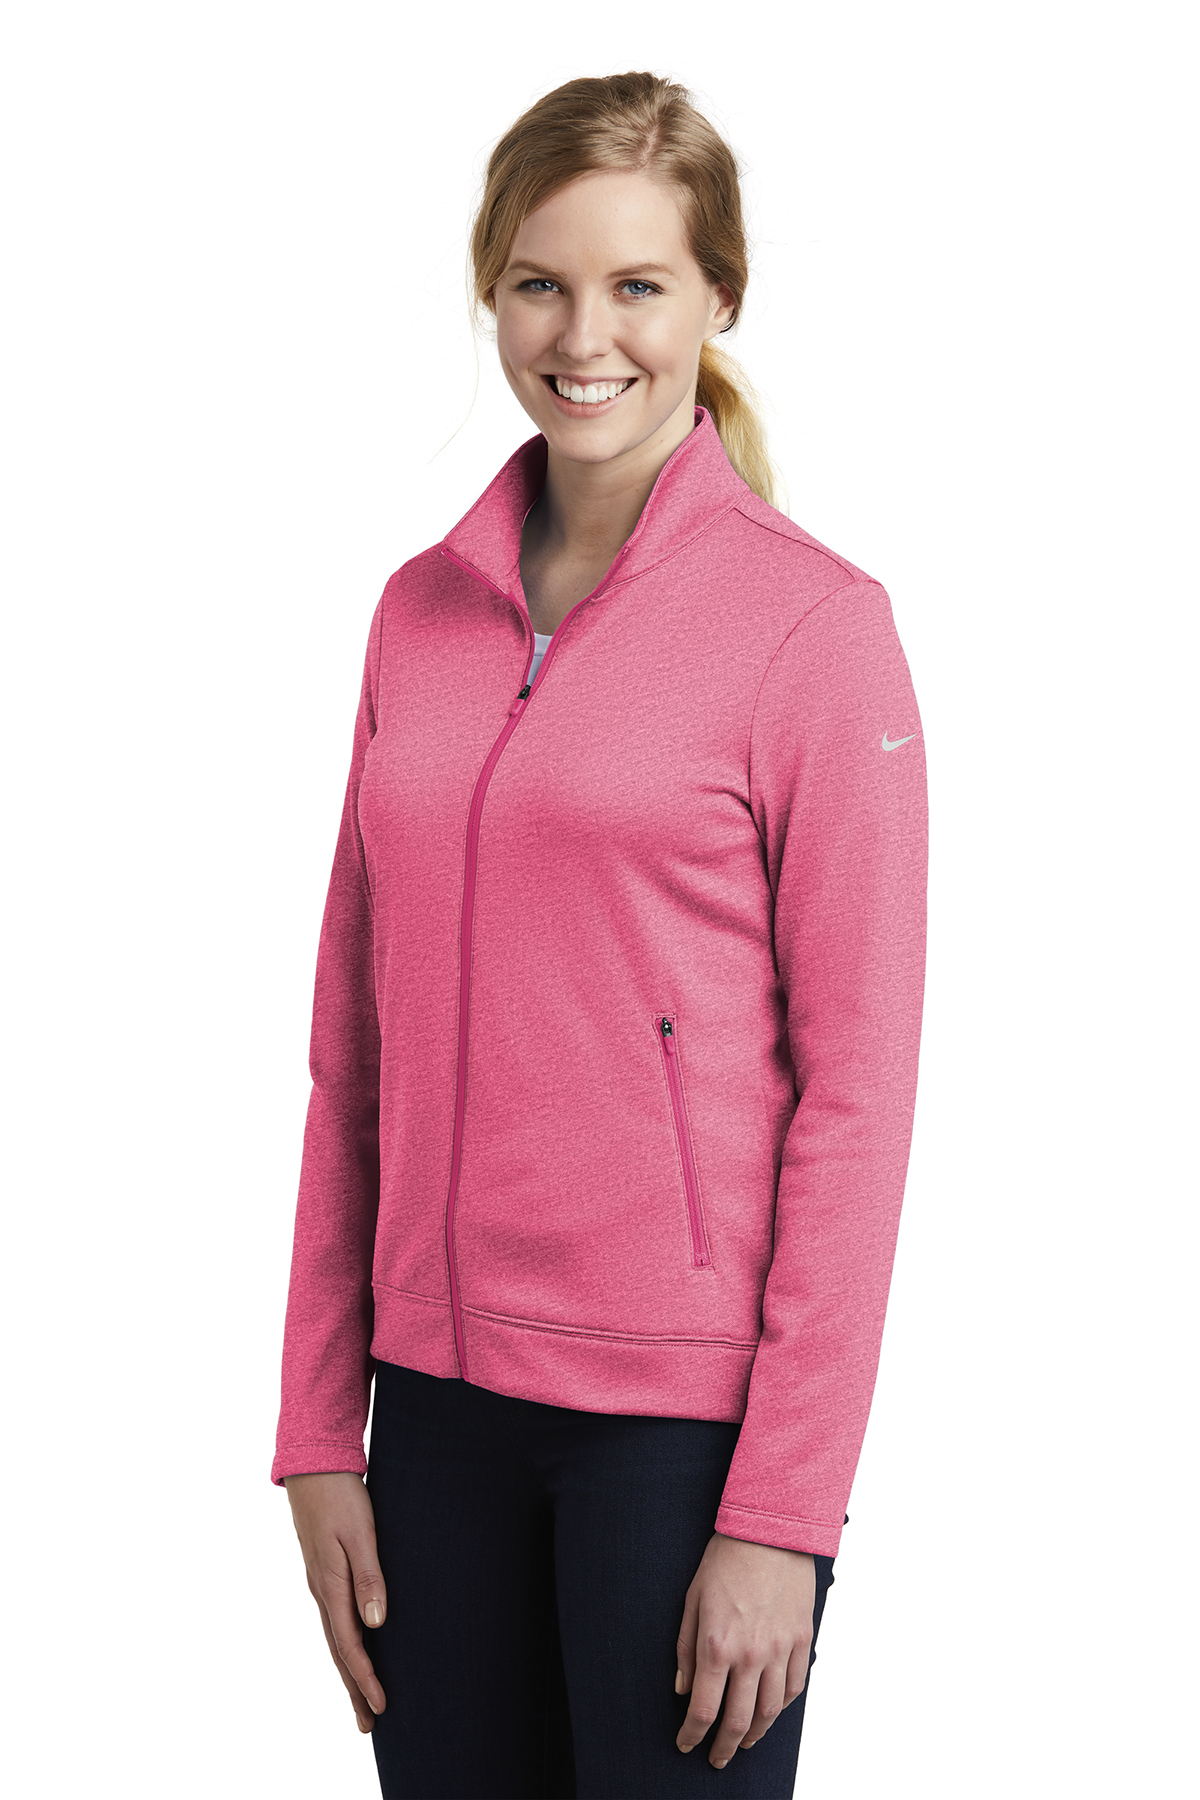 Therma Nike Full FleeceSweatshirtsfleece Ladies Zip Fit H29IDE